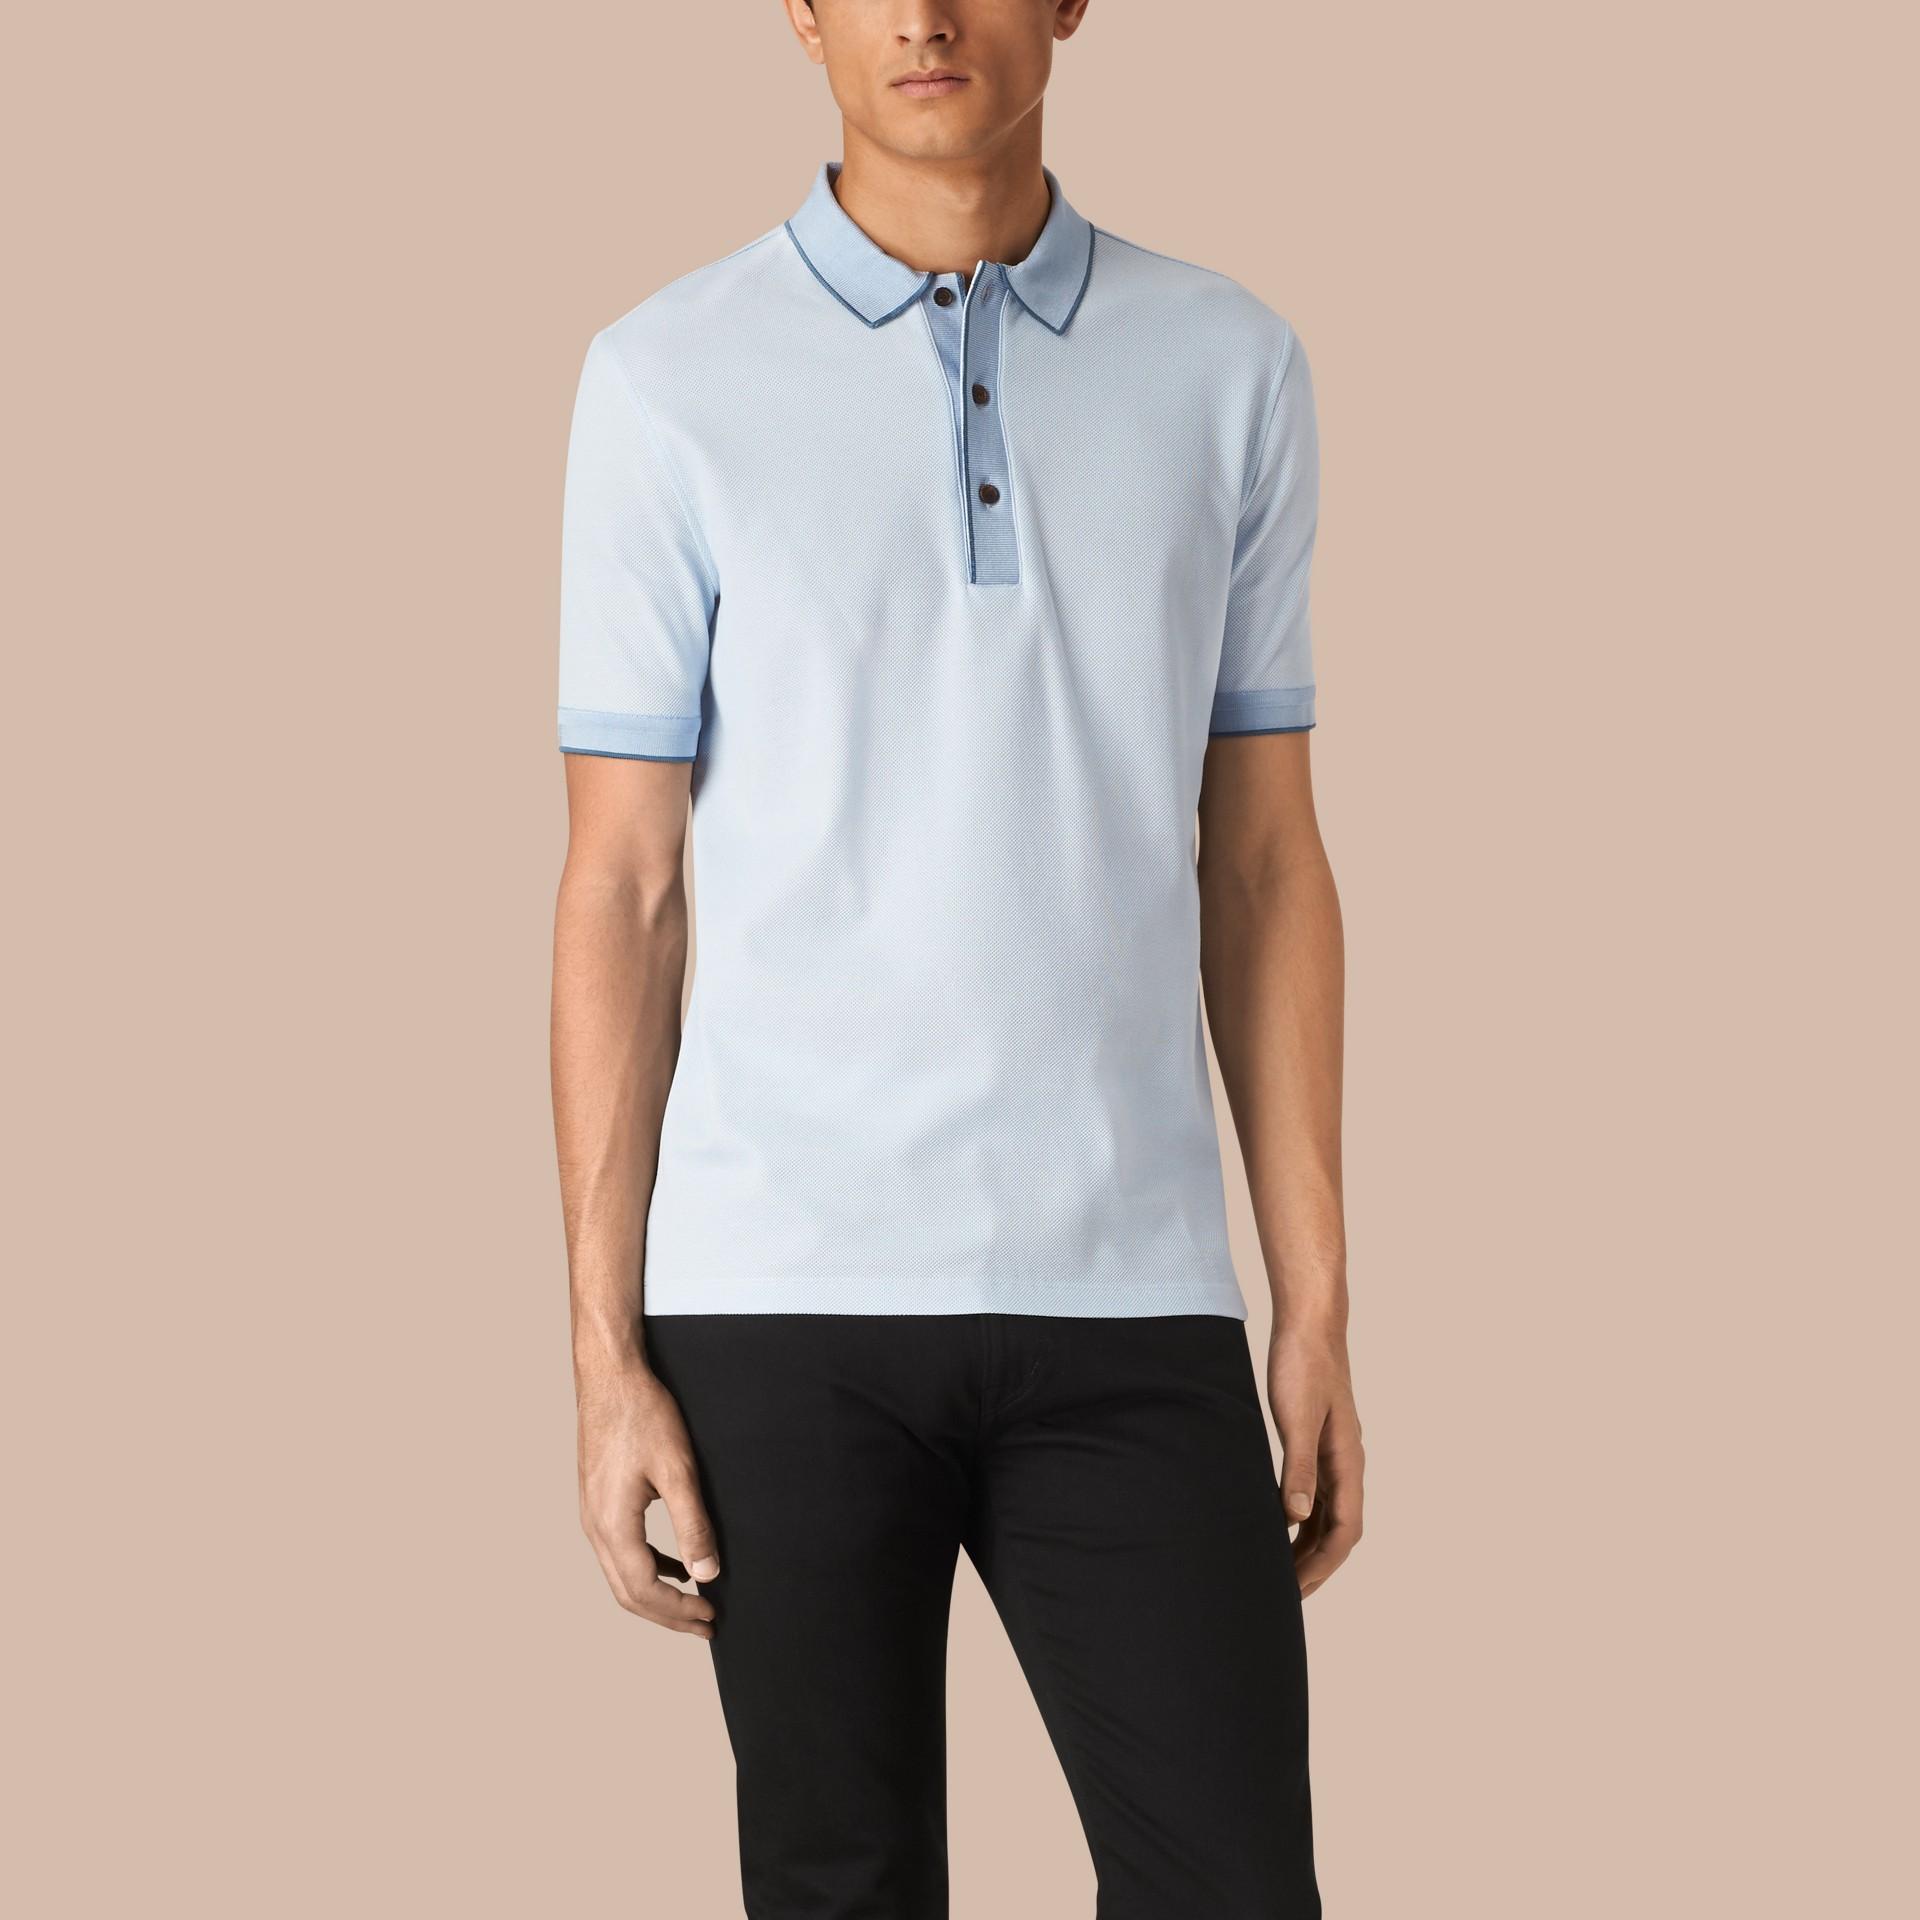 Sky blue/blue azure Contrast Tipping Cotton Piqué Polo Shirt Sky Blue/blue Azure - gallery image 1